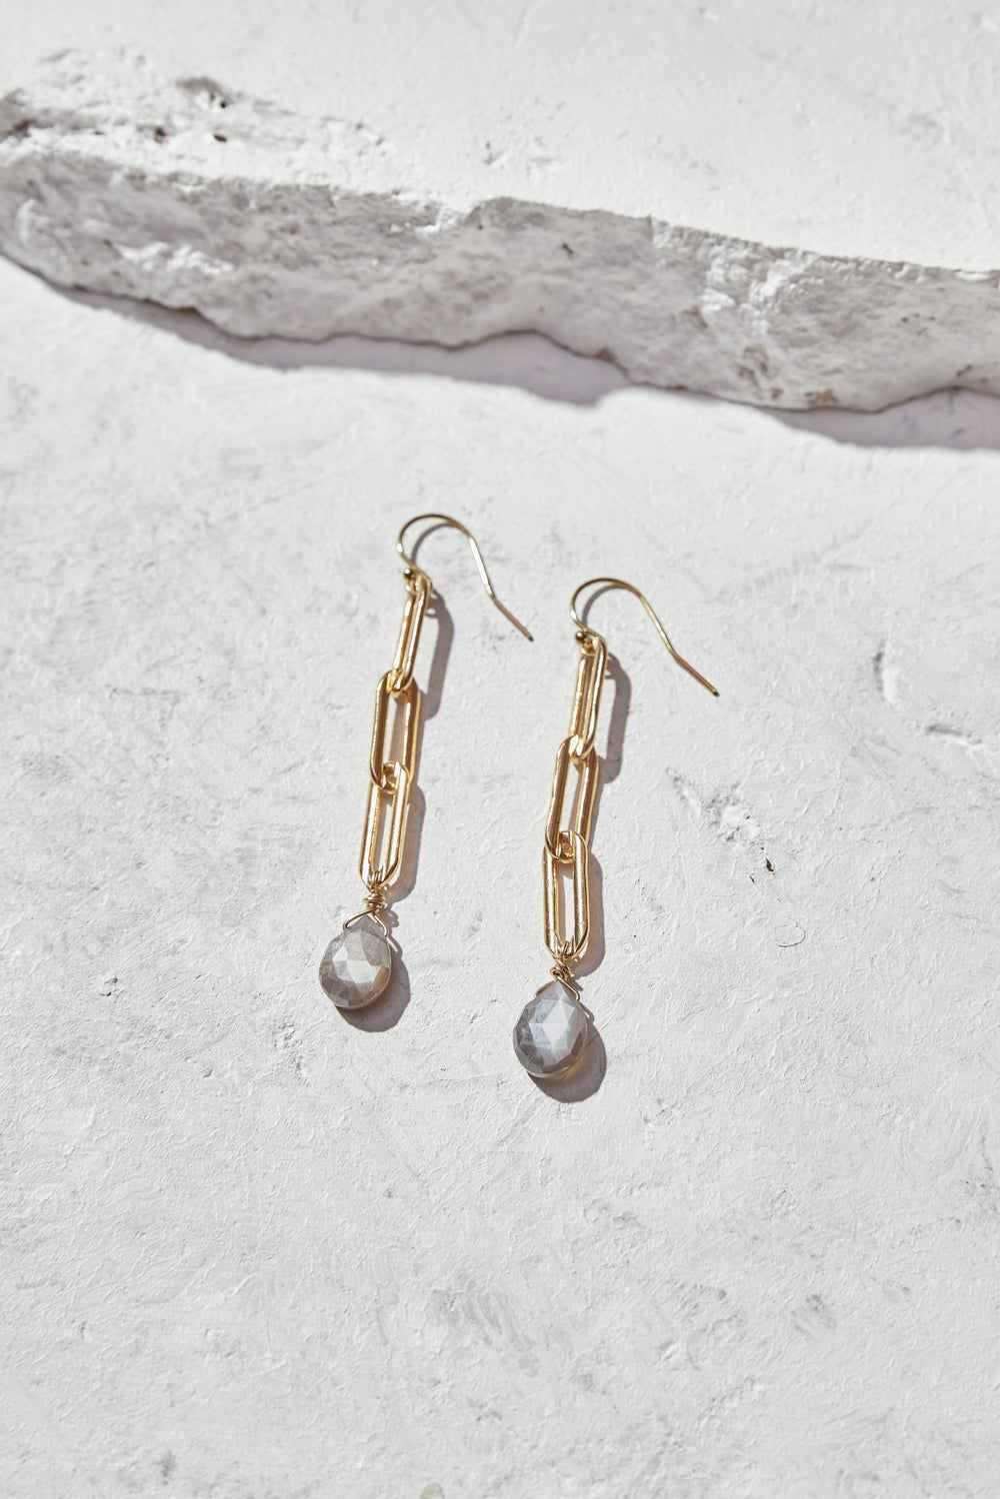 Image of Moonstone Earrings